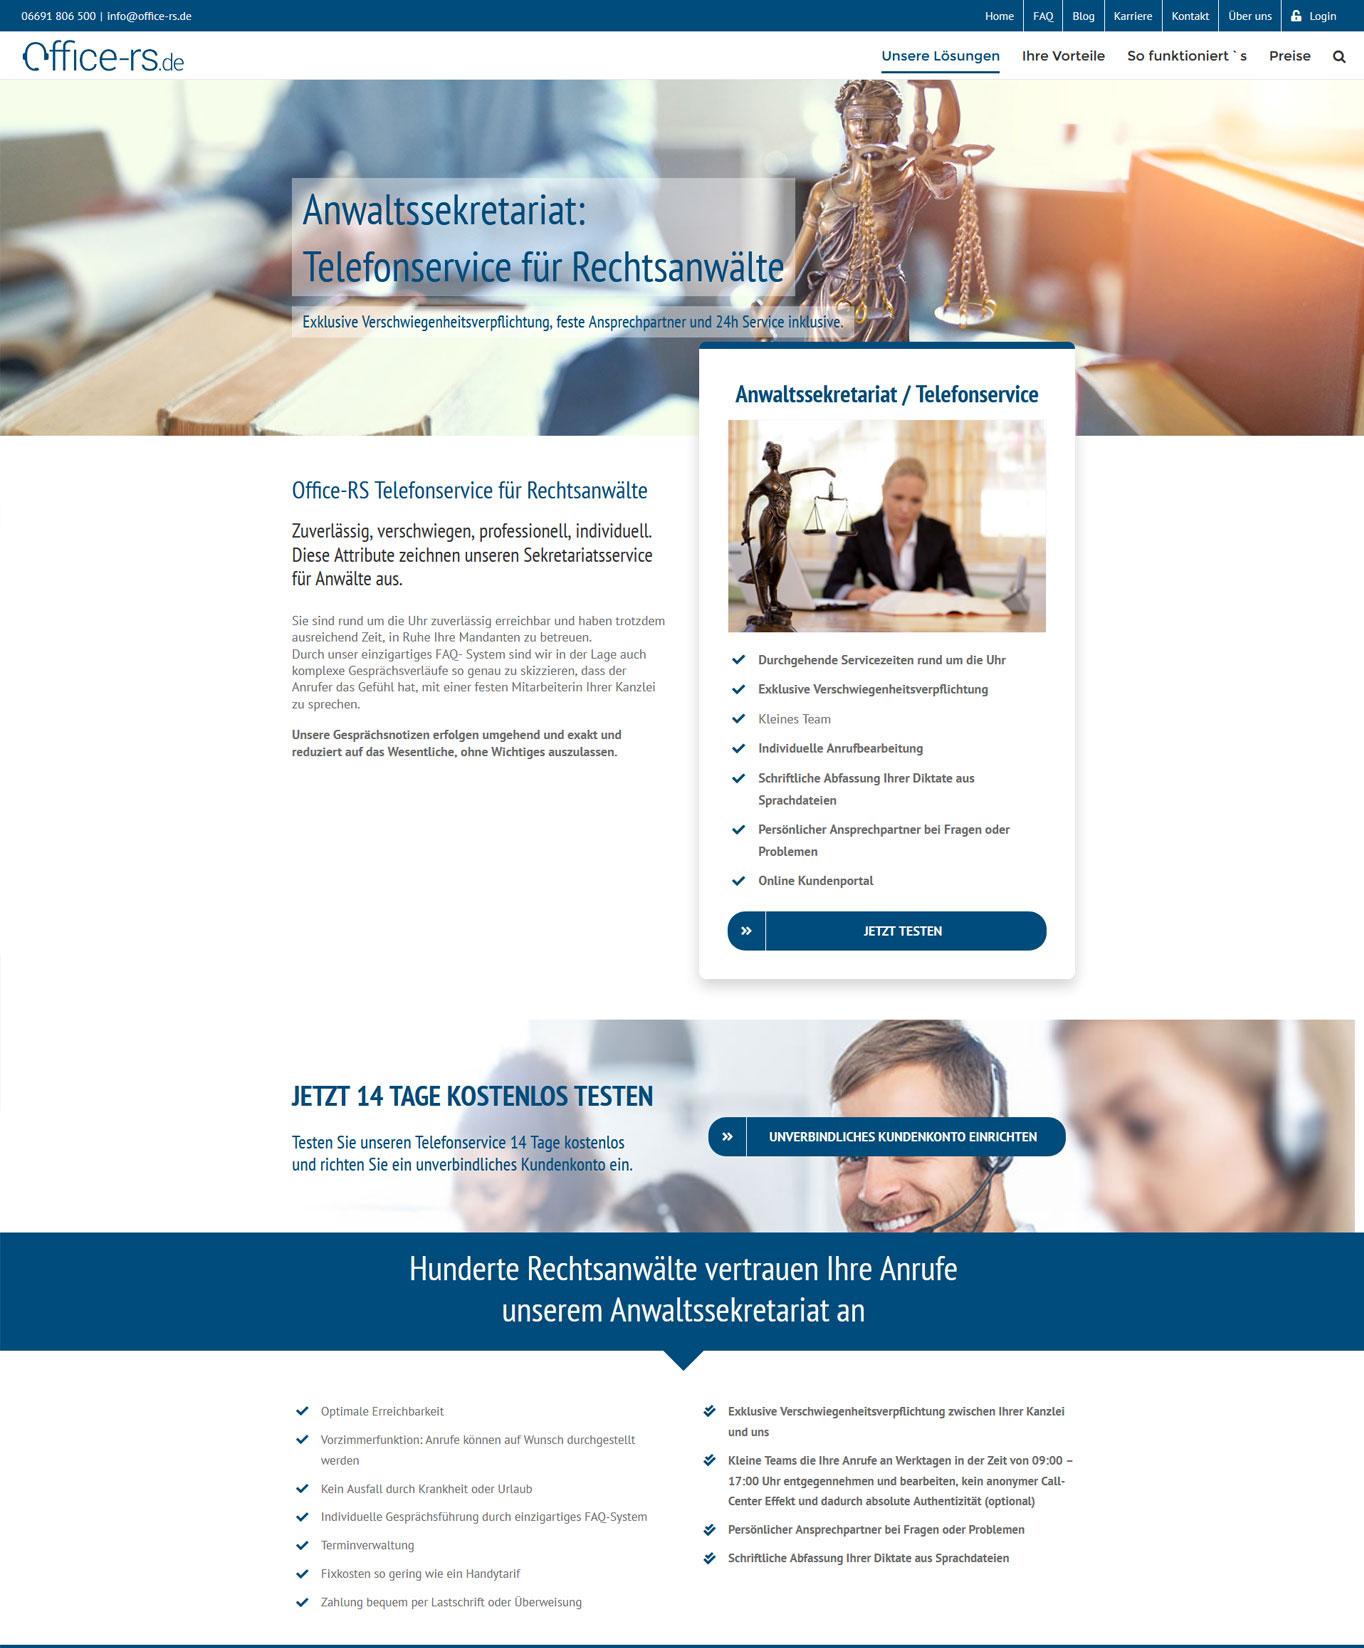 Office-rs-Telefonservice für Rechtsanwaelte